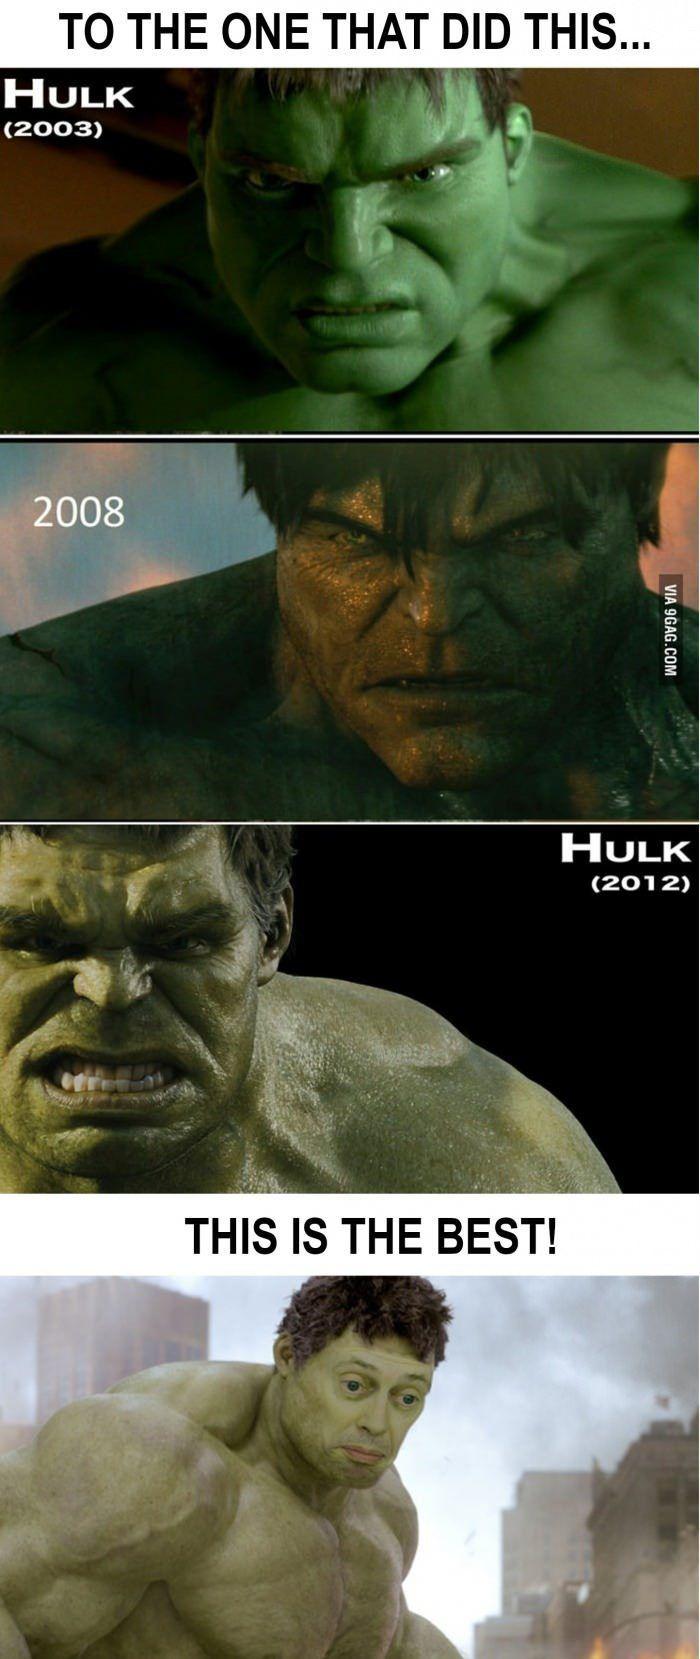 The Hulk Meme : Animatedtimies, Incredibly, Funny, Memes, Hulk,, Incredible, Marvel